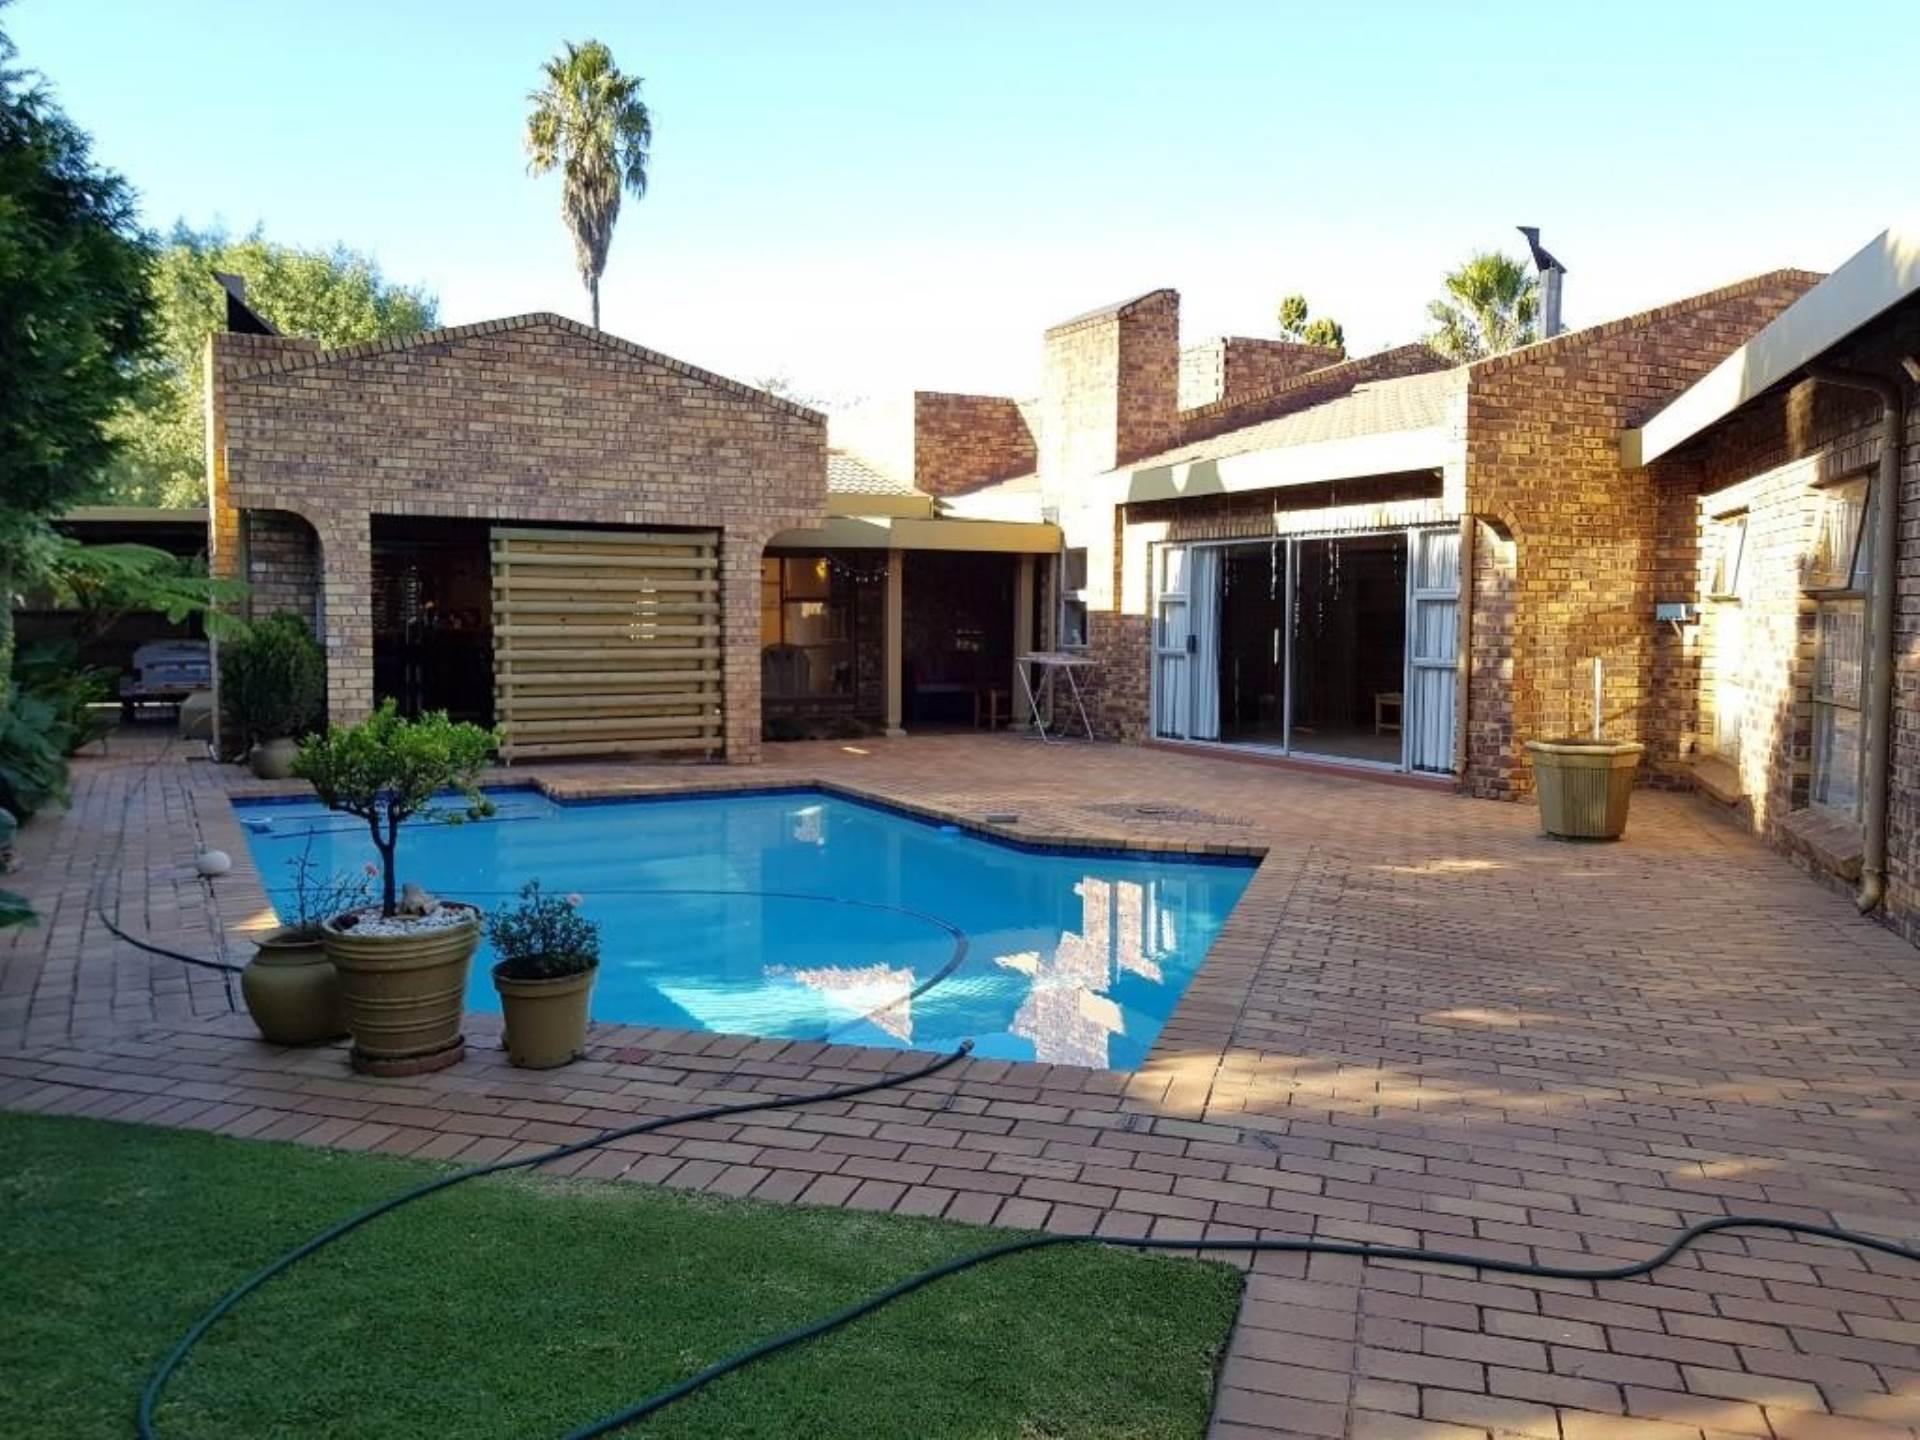 4 BedroomHouse For Sale In Sunward Park